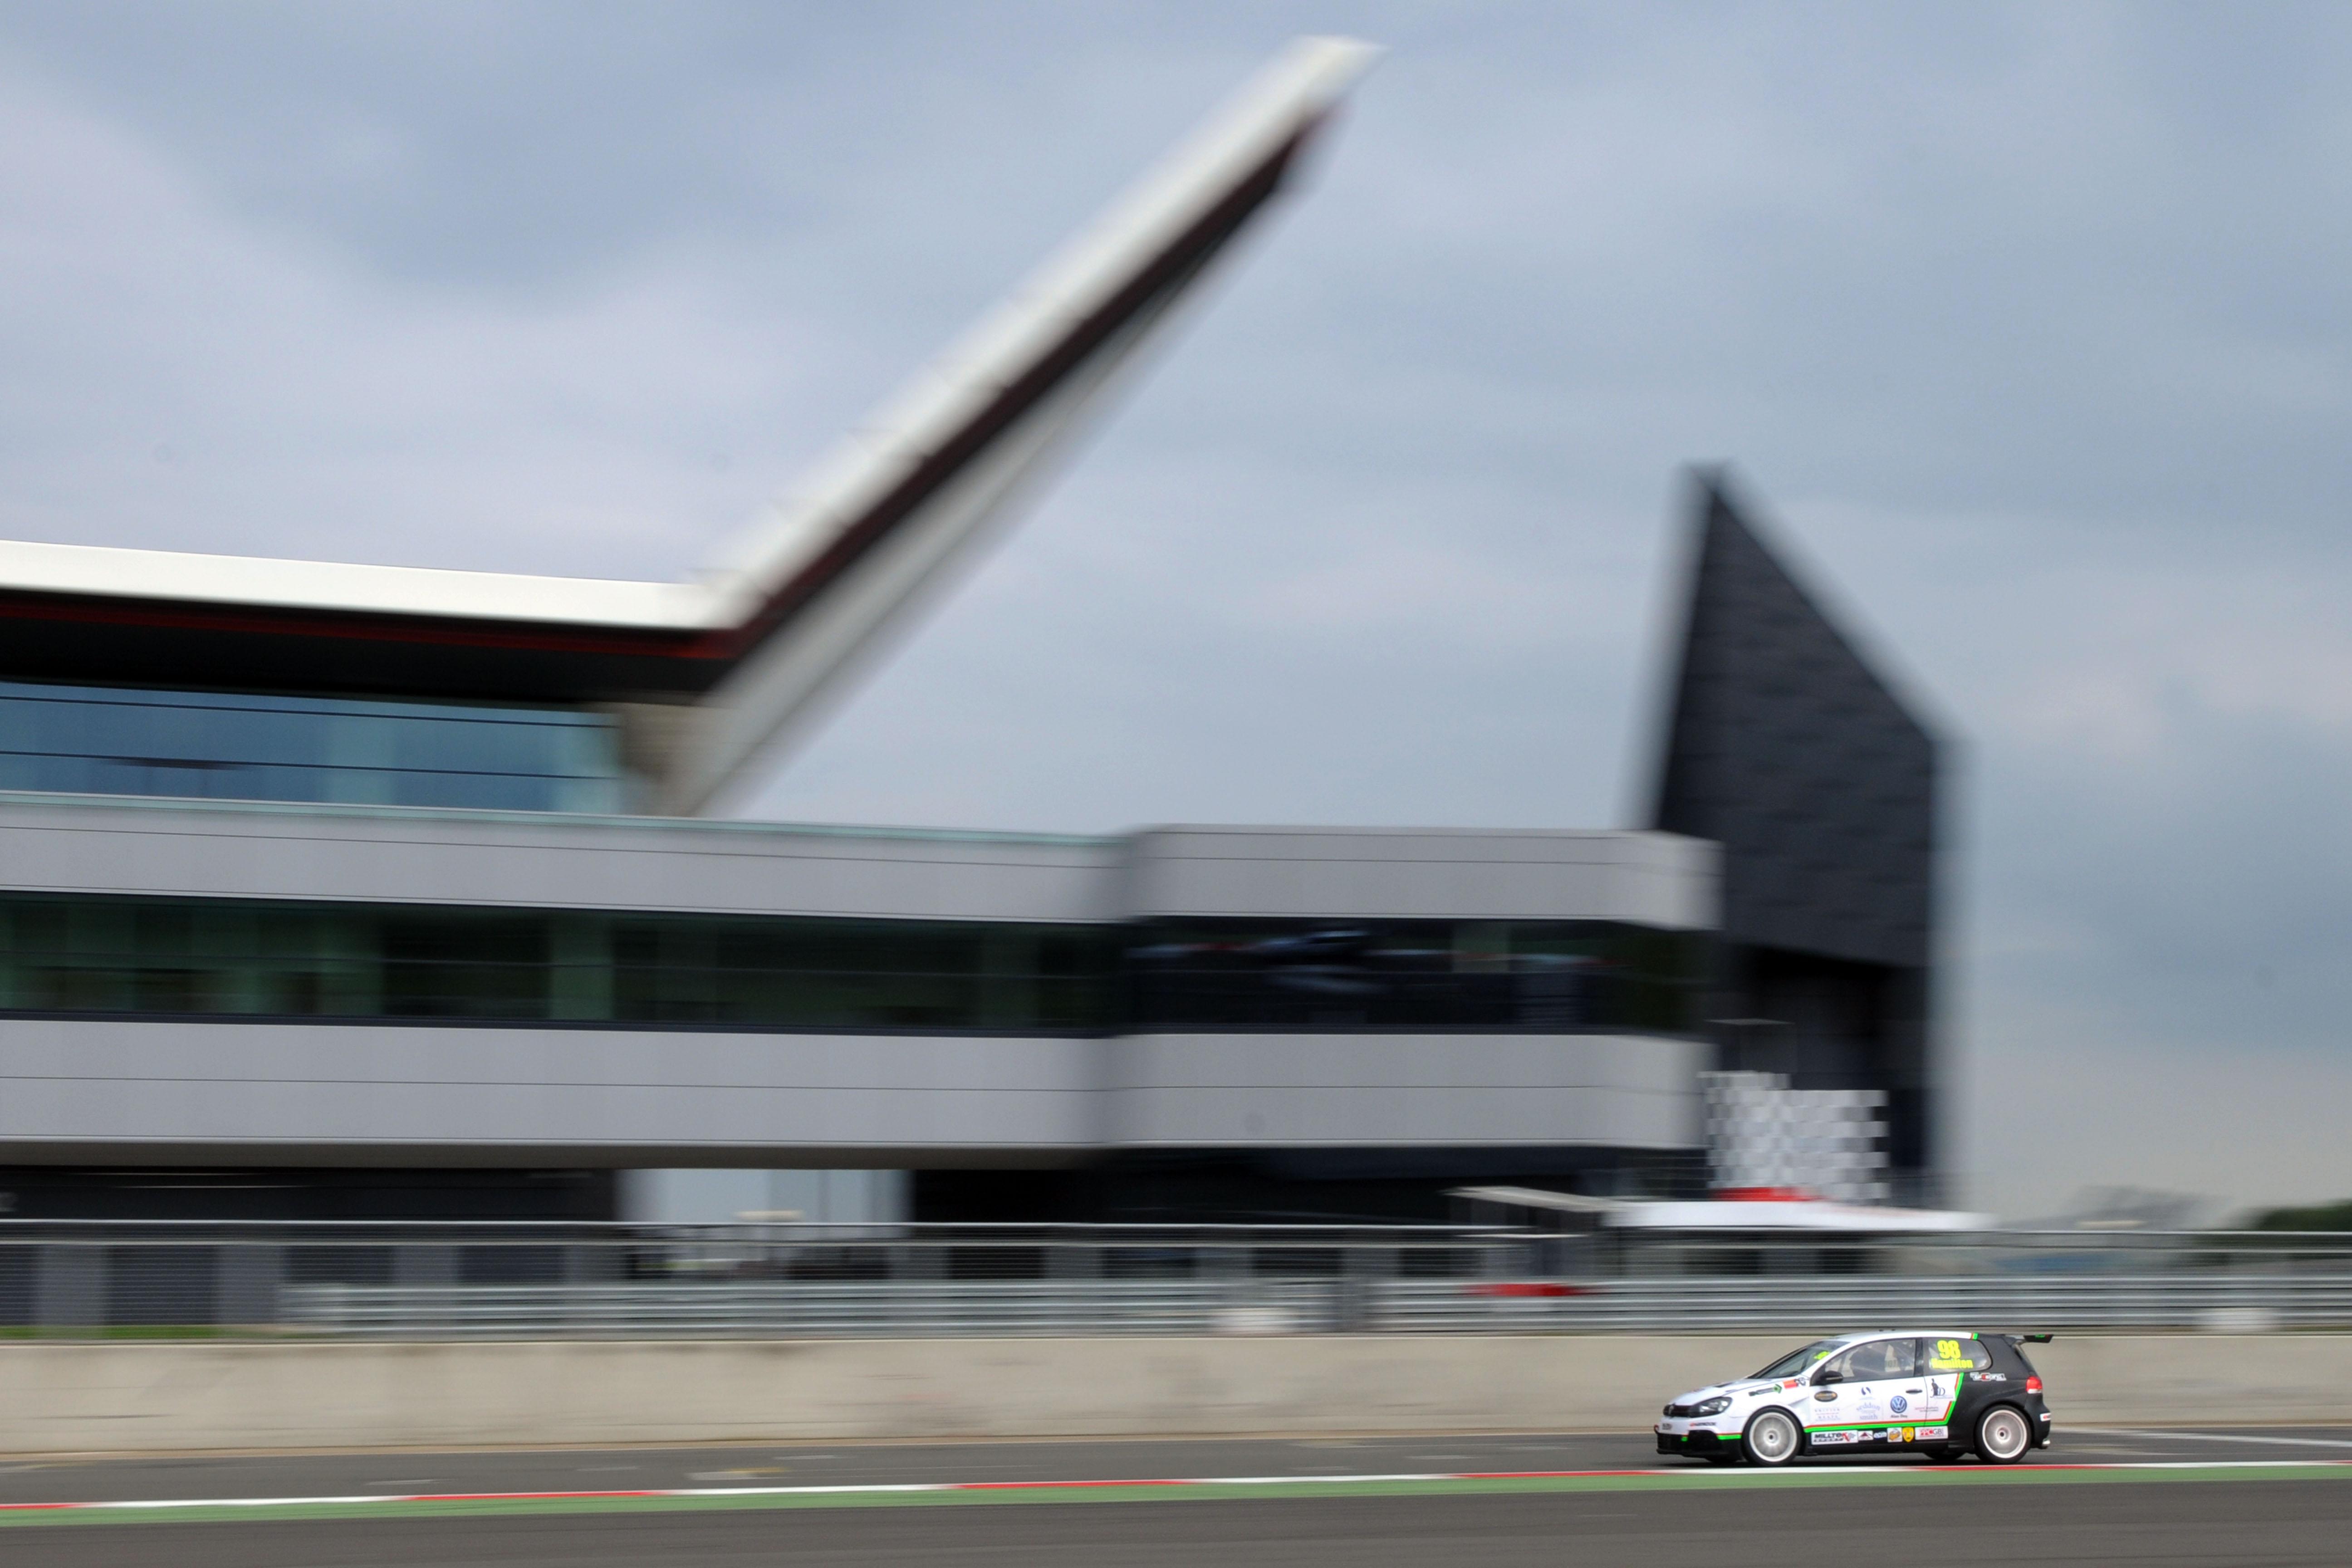 Silverstone-026.jpg